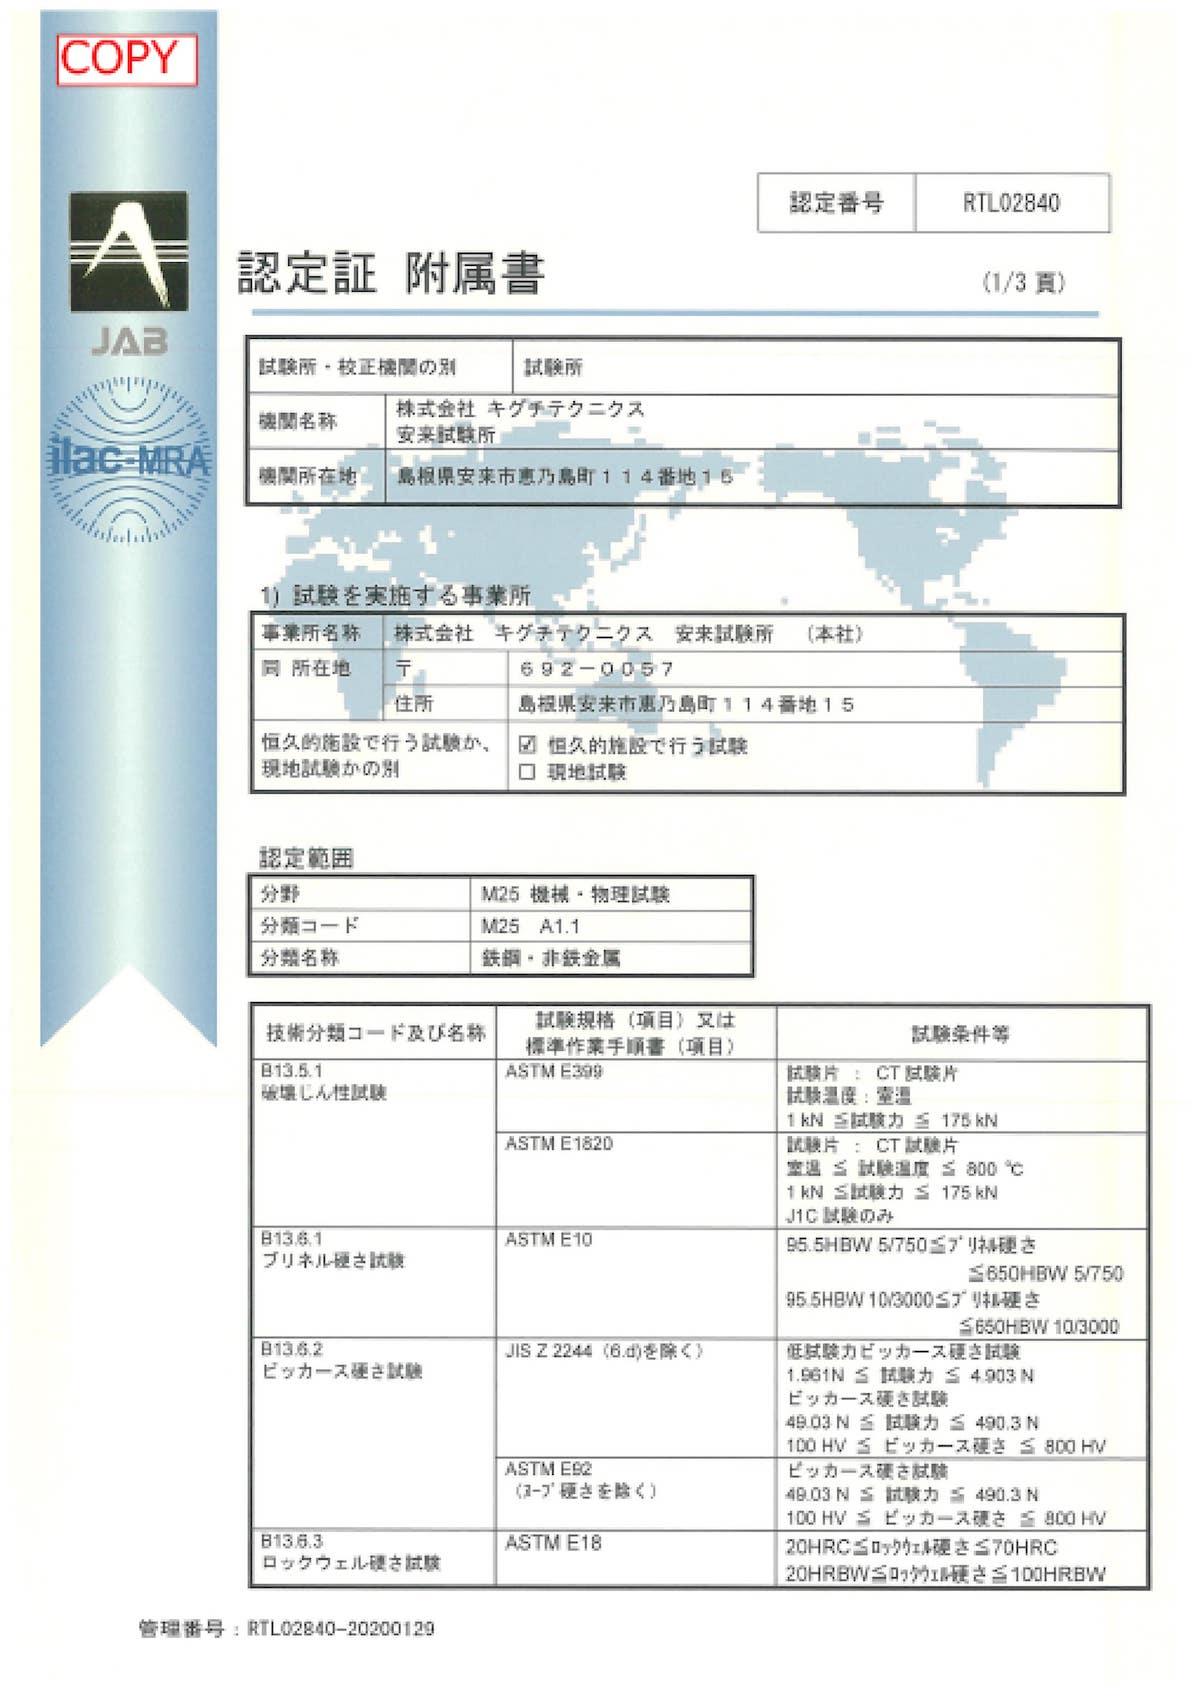 ISO/IEC 17025